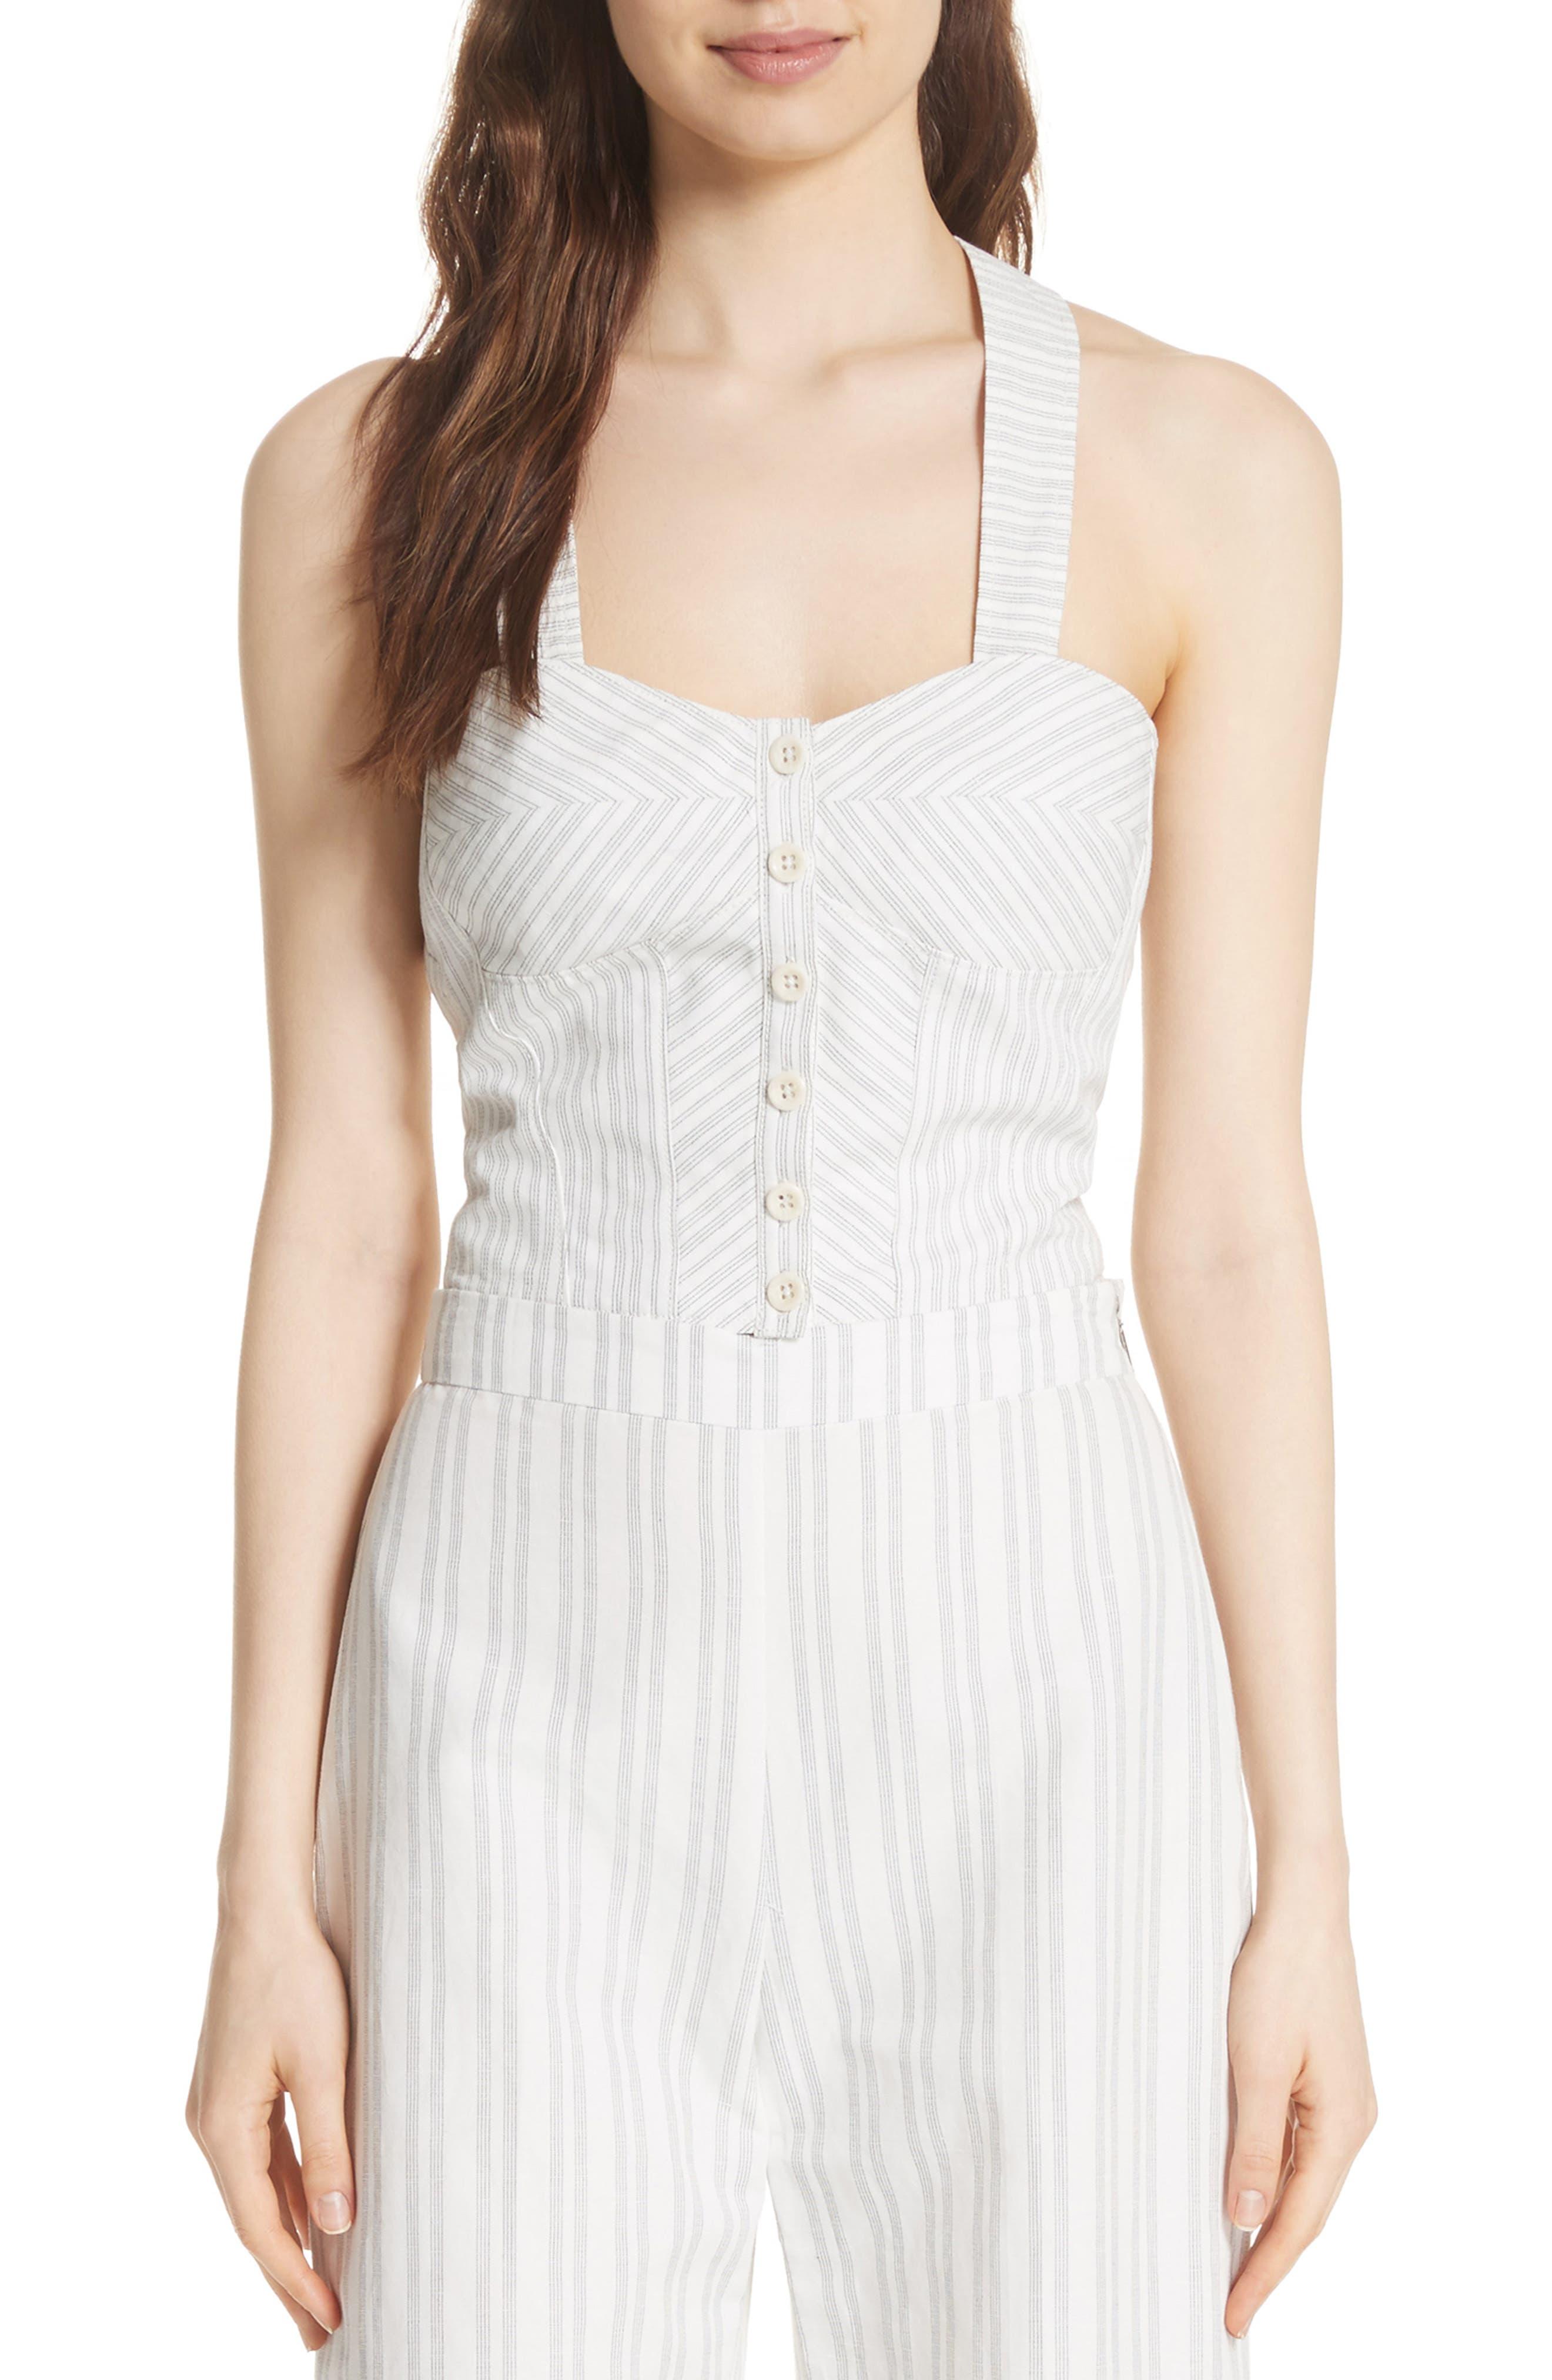 REBECCA TAYLOR Crisscross Back Stripe Cotton Linen Top, Main, color, 199